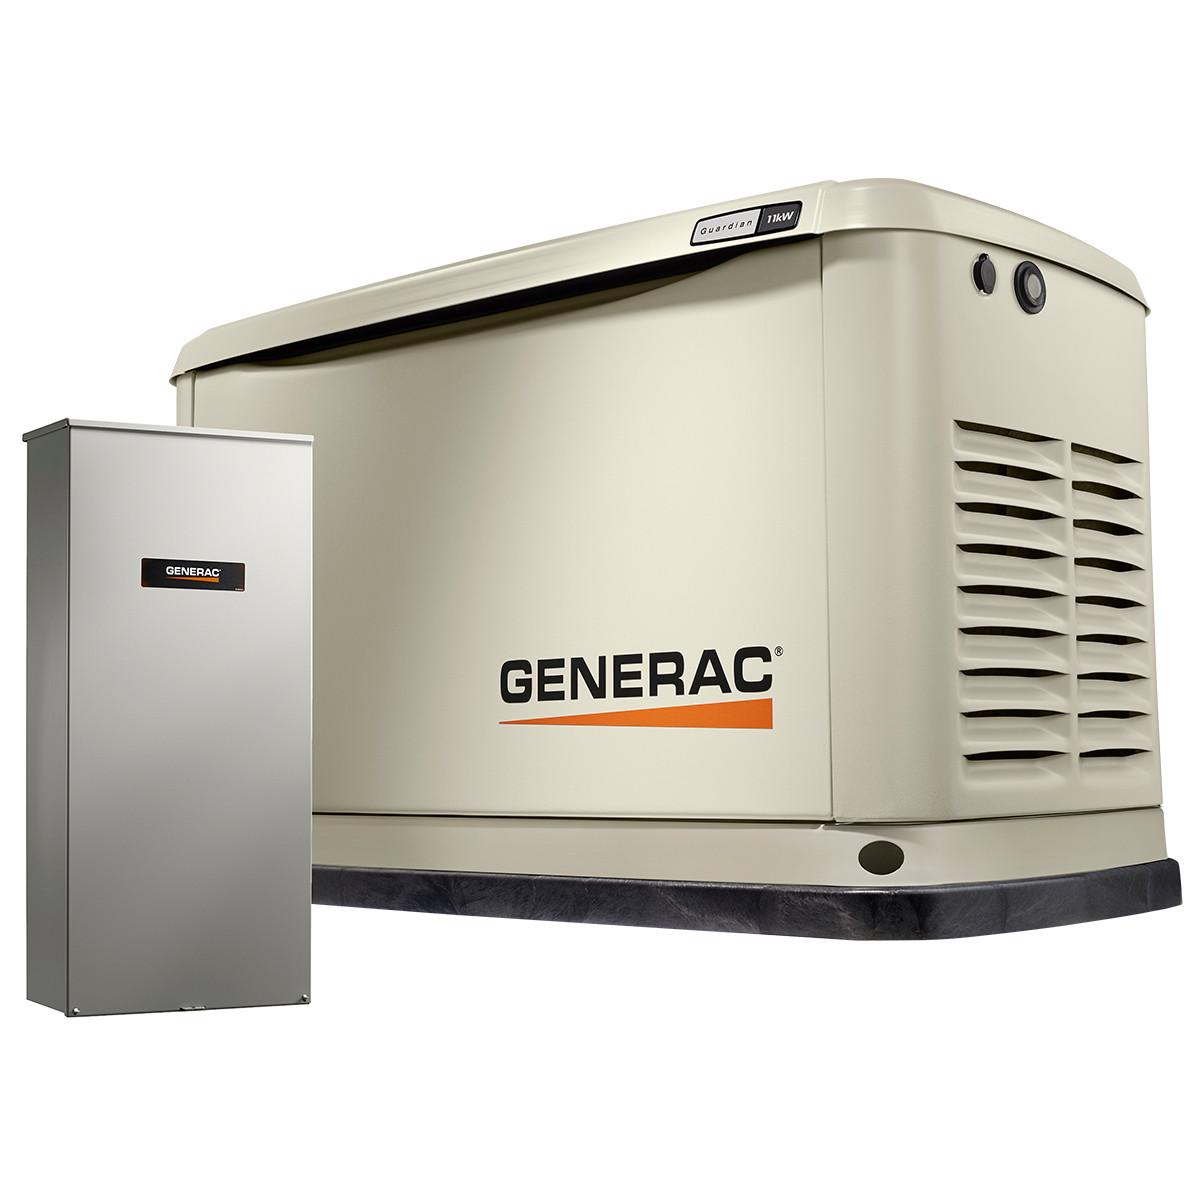 Generac 7032 11kW Guardian Generator with Wi-Fi & 100A 16-circuit Transfer  Switch